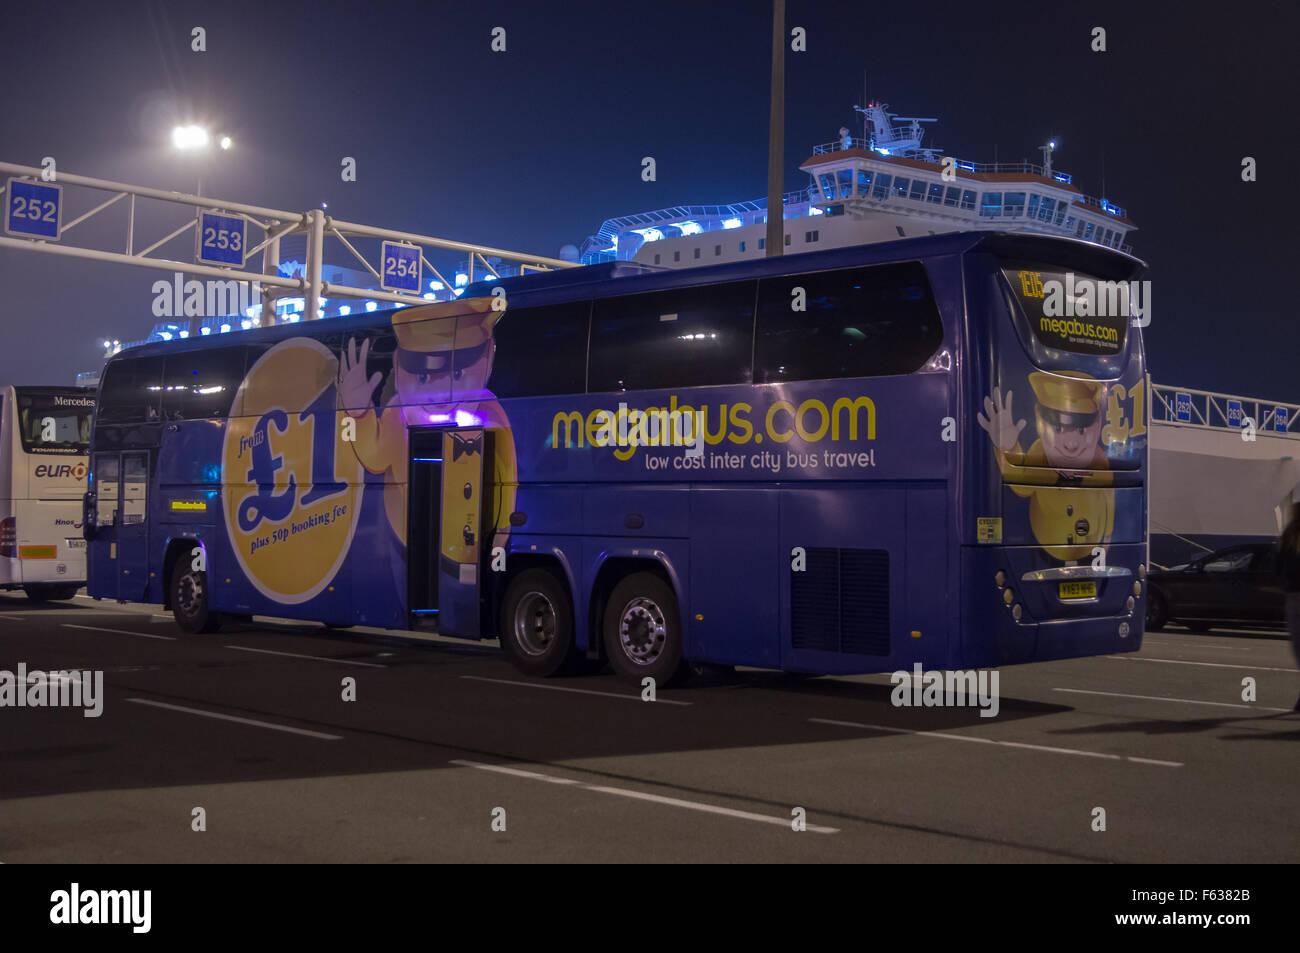 a-megabus-international-coach-with-a-pos